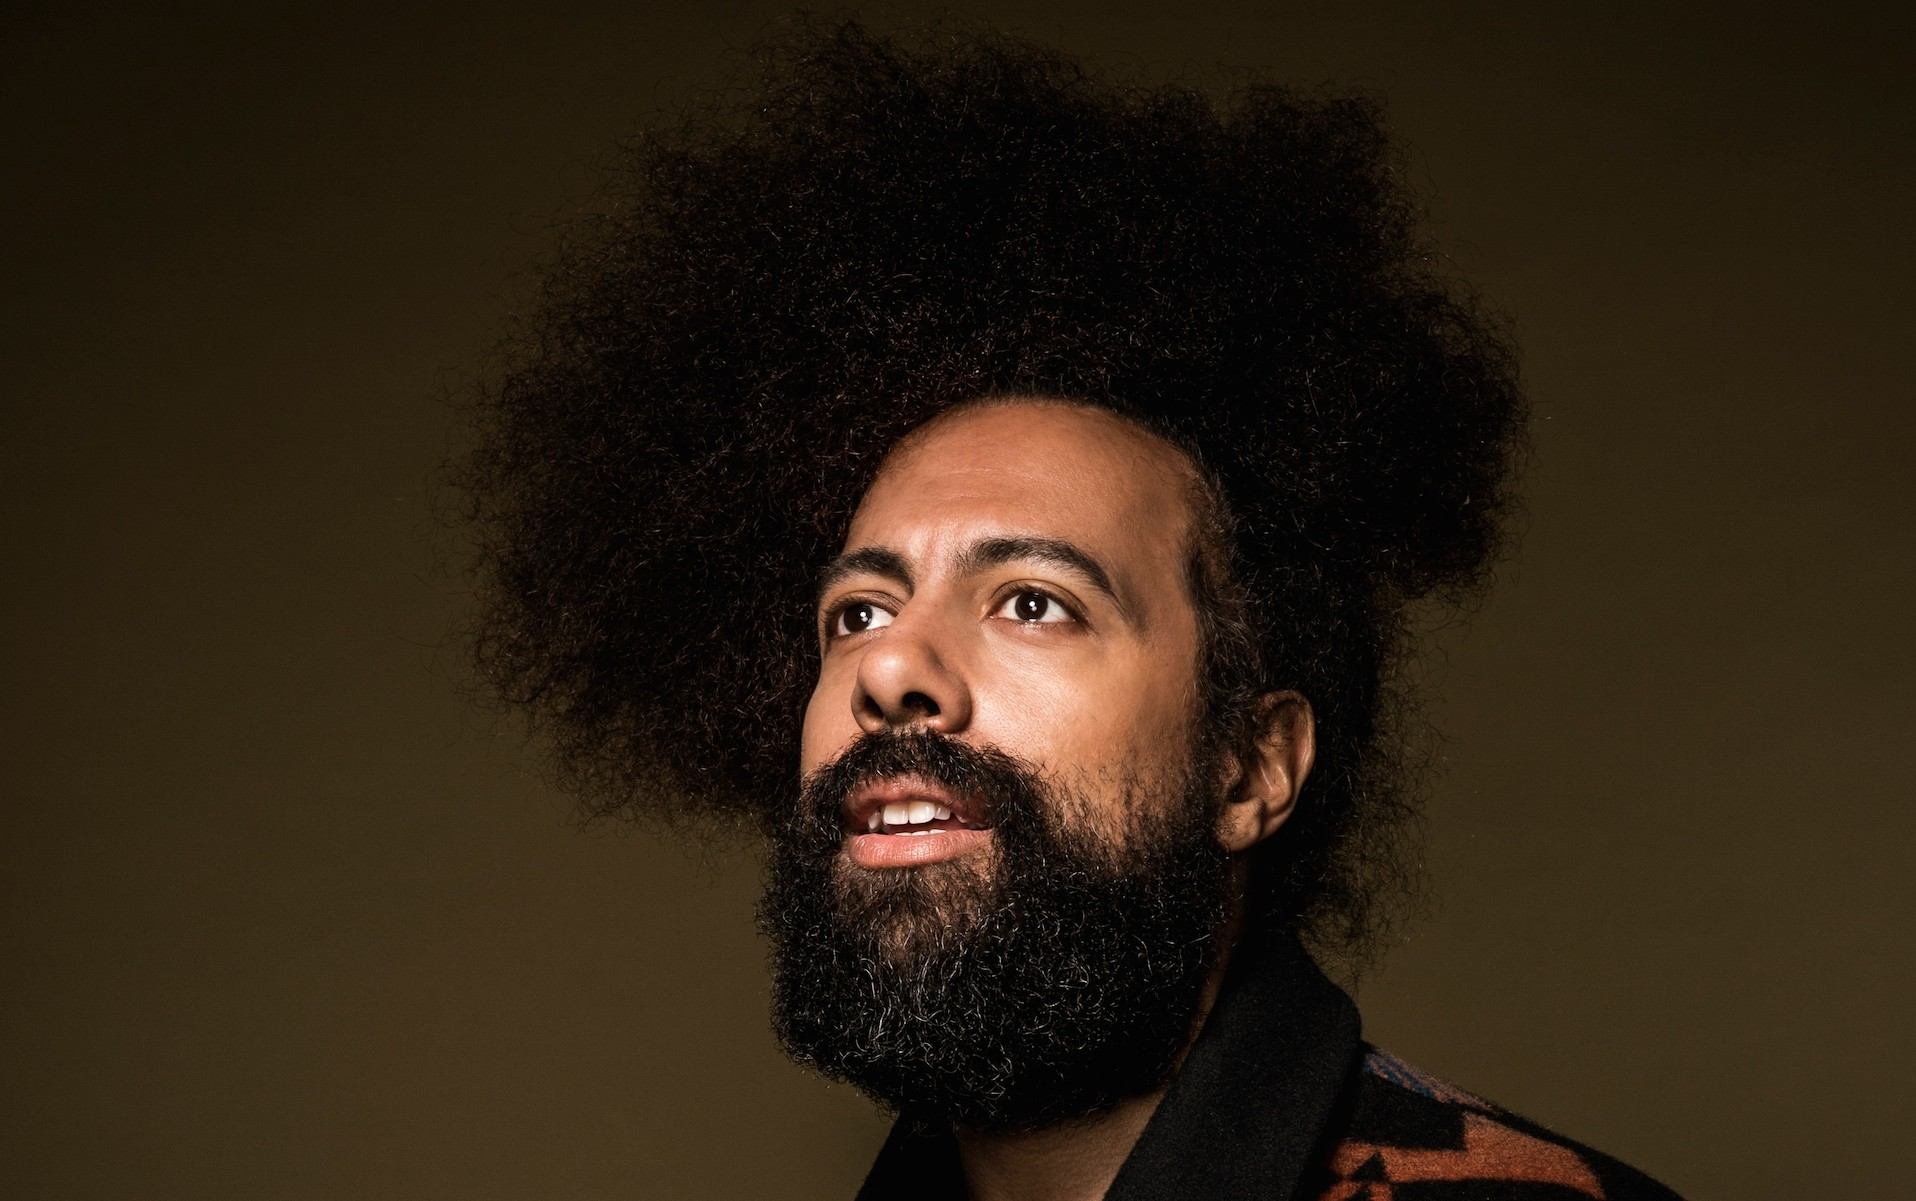 Reggie Watts German Artist, Musician, Comedian